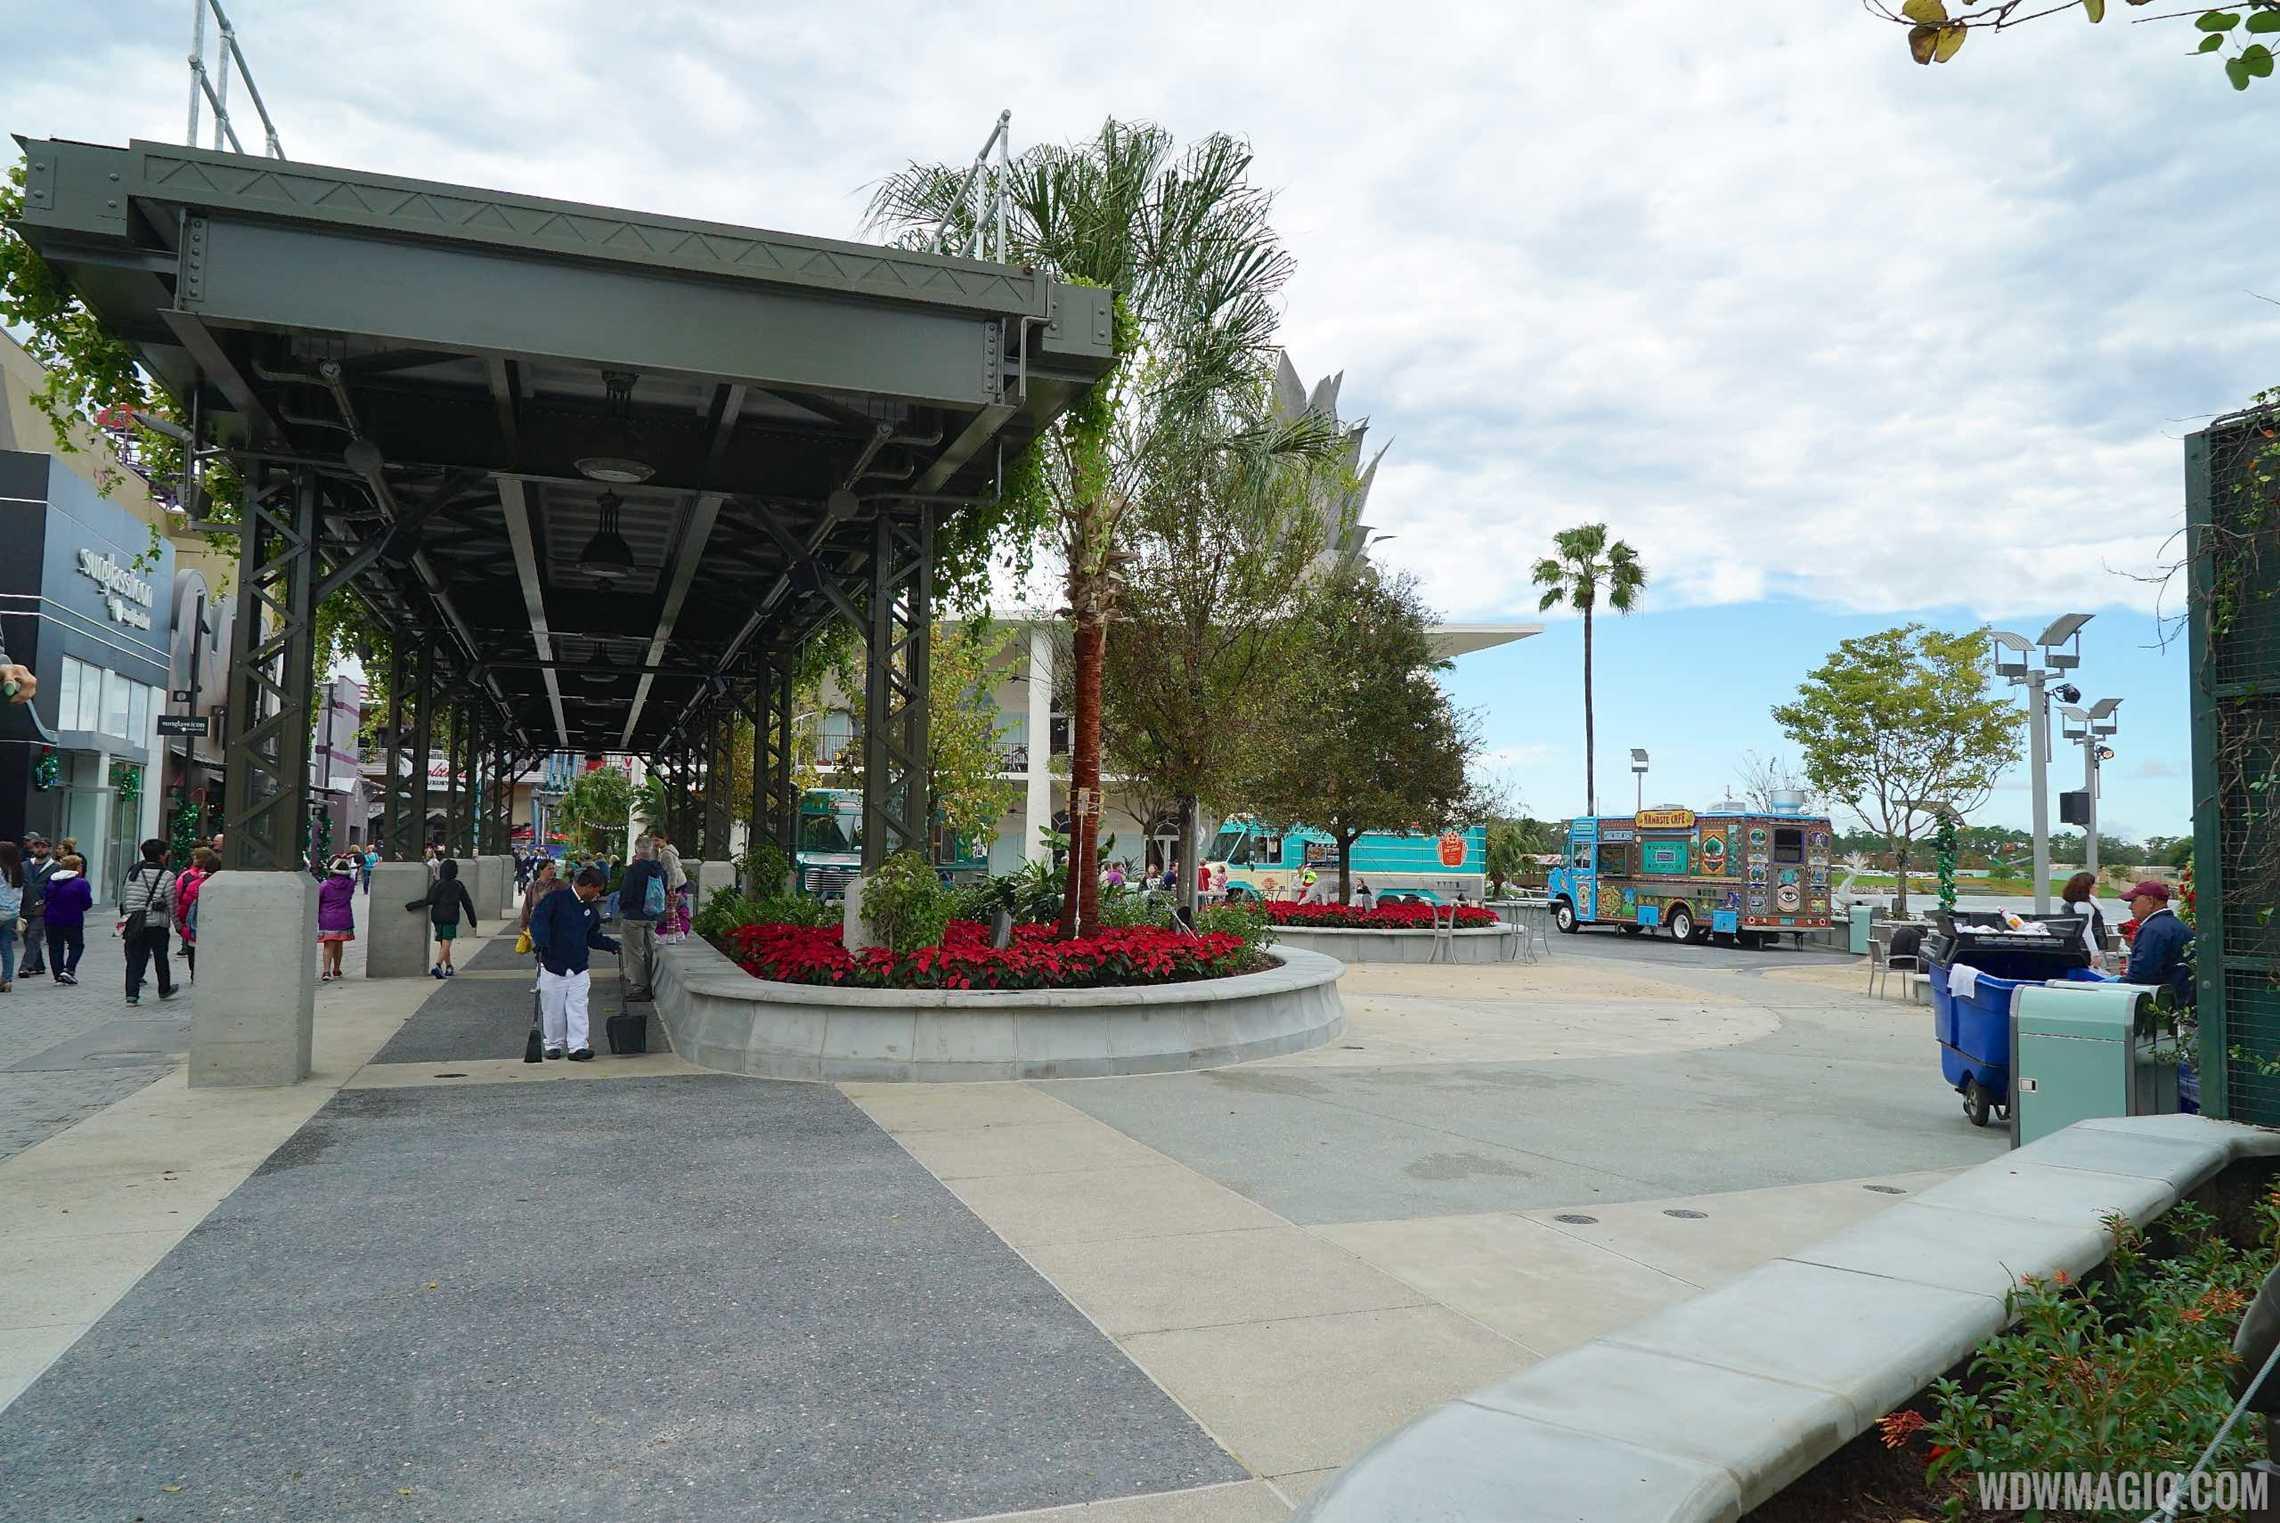 West Side Food Truck Park